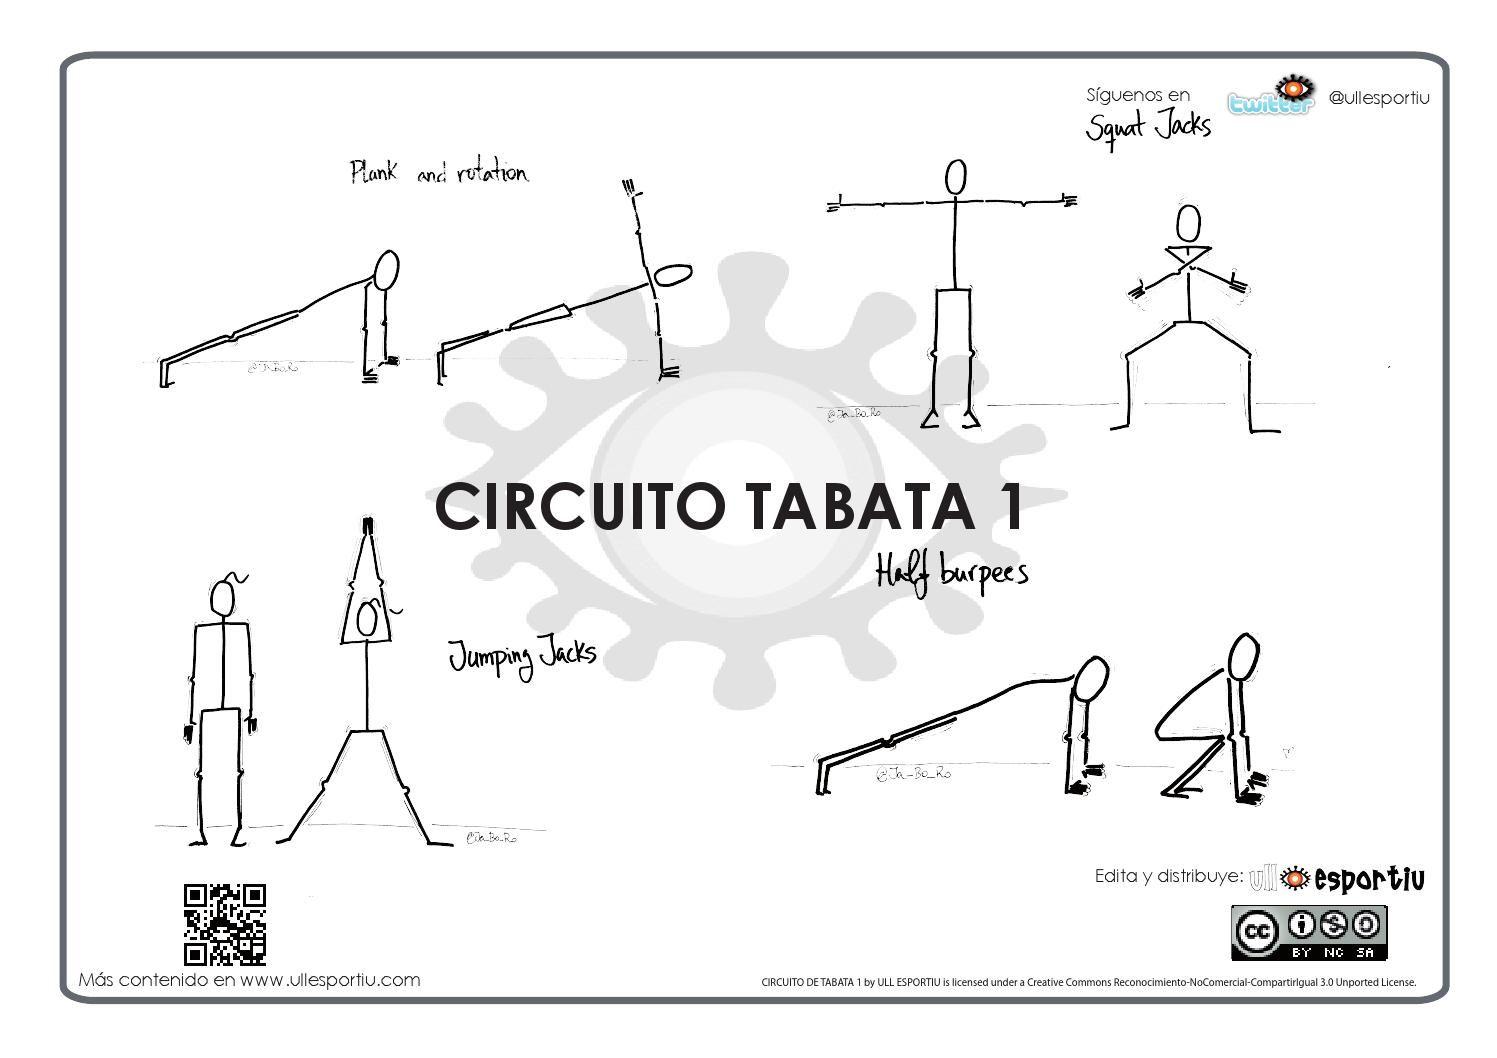 Circuito Tabata : Circuito tabata tabata and squat